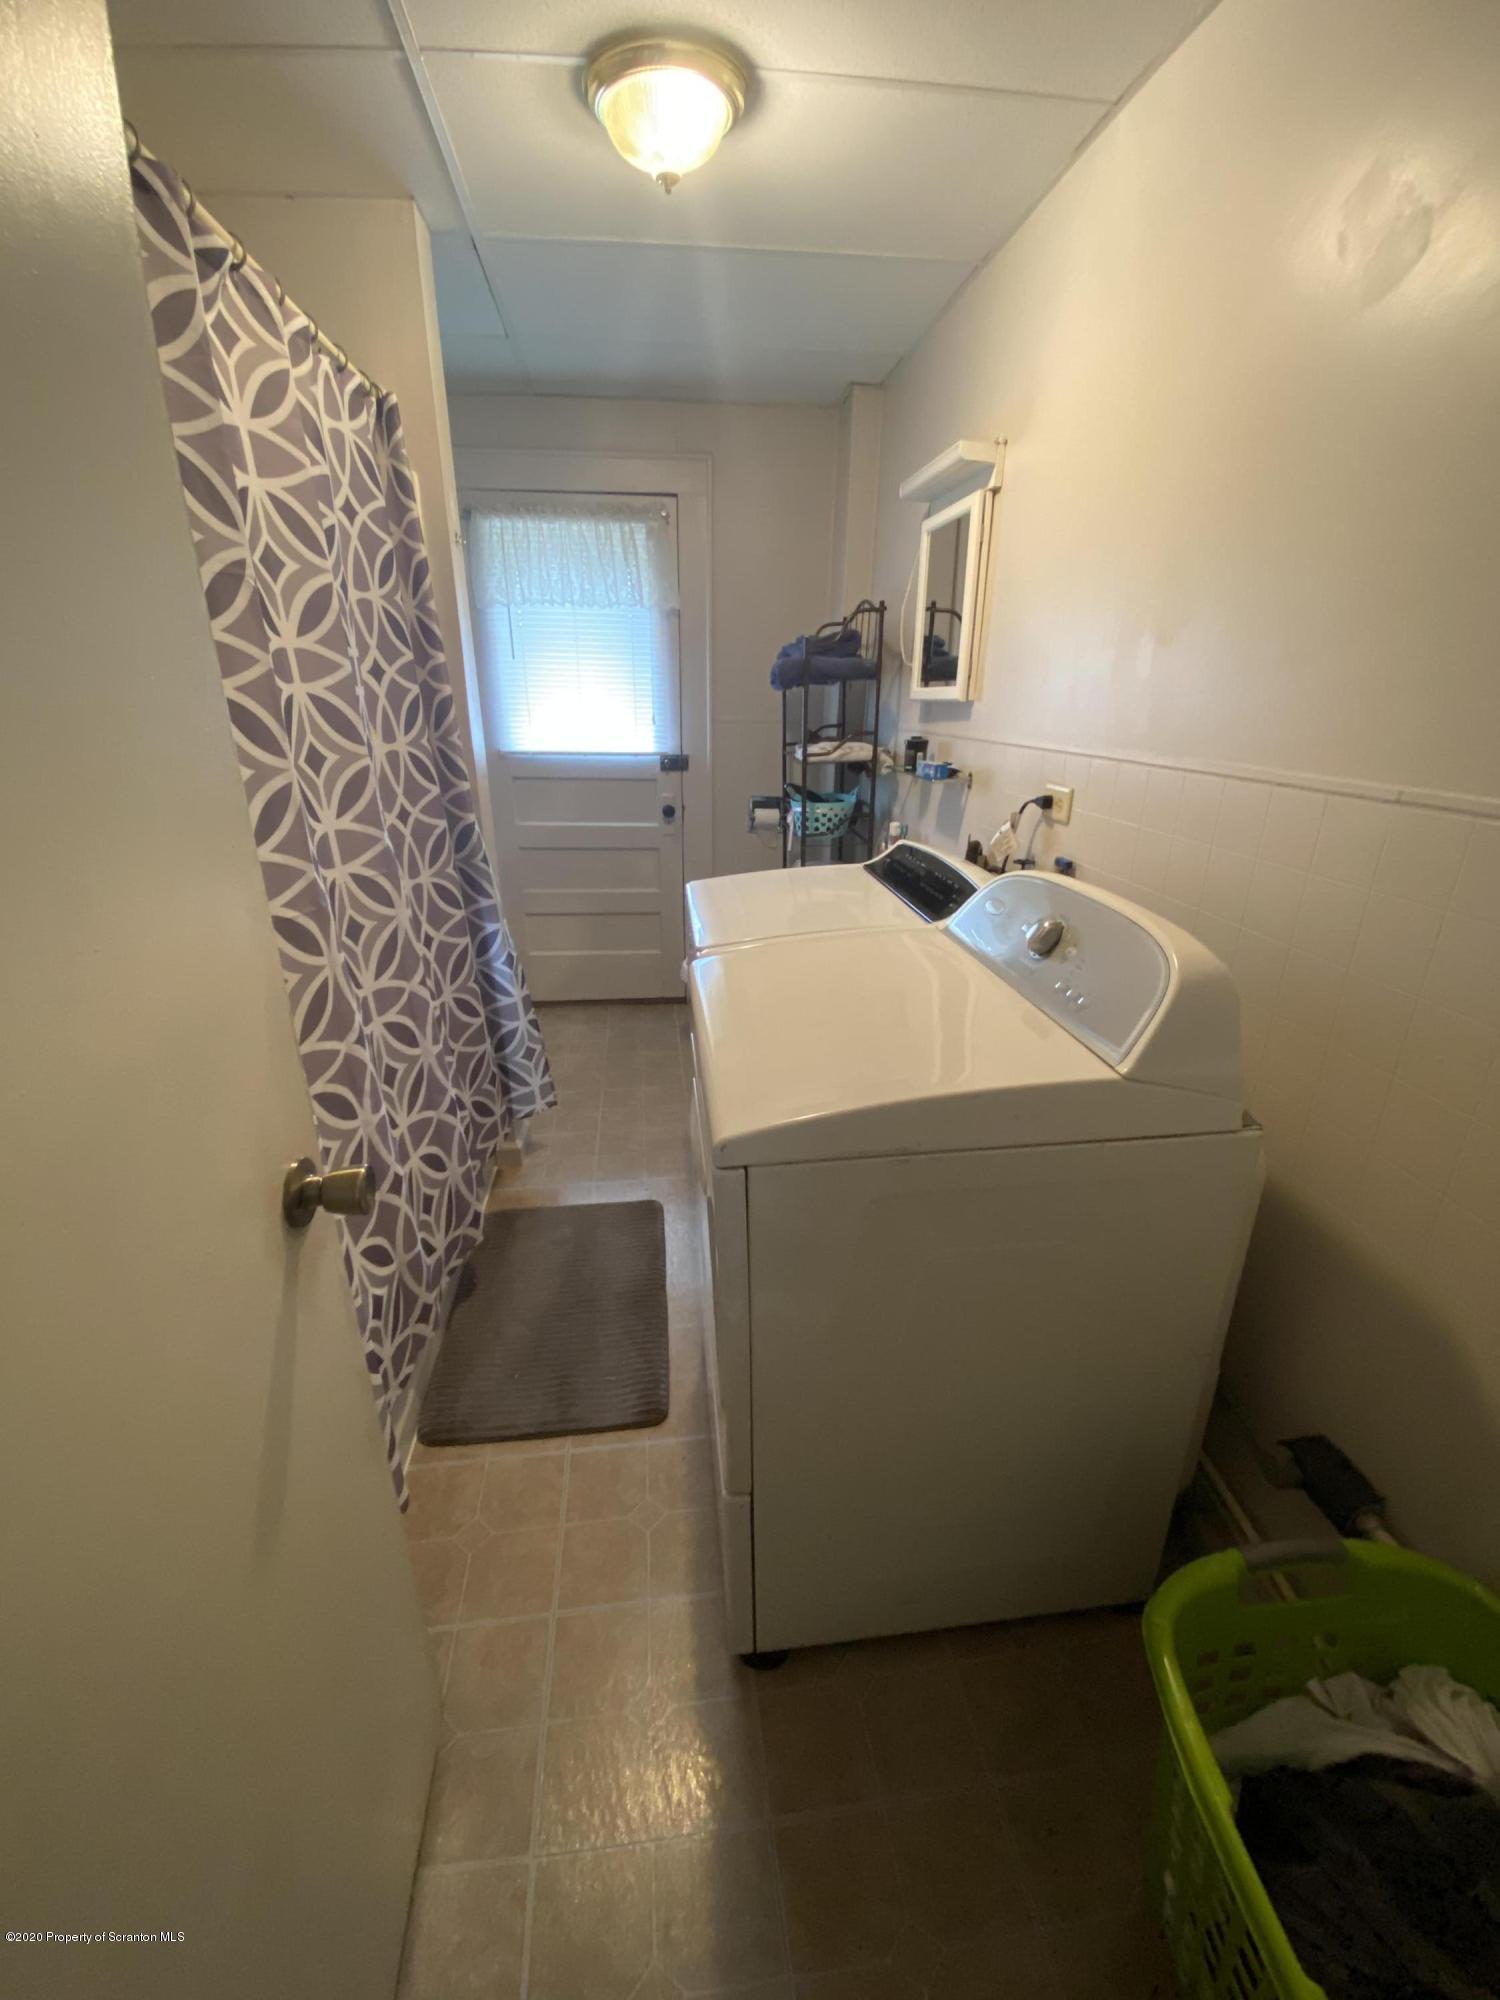 2436 Main Ave, Scranton, Pennsylvania 18508, ,1 BathroomBathrooms,Commercial,For Sale,Main,20-3773